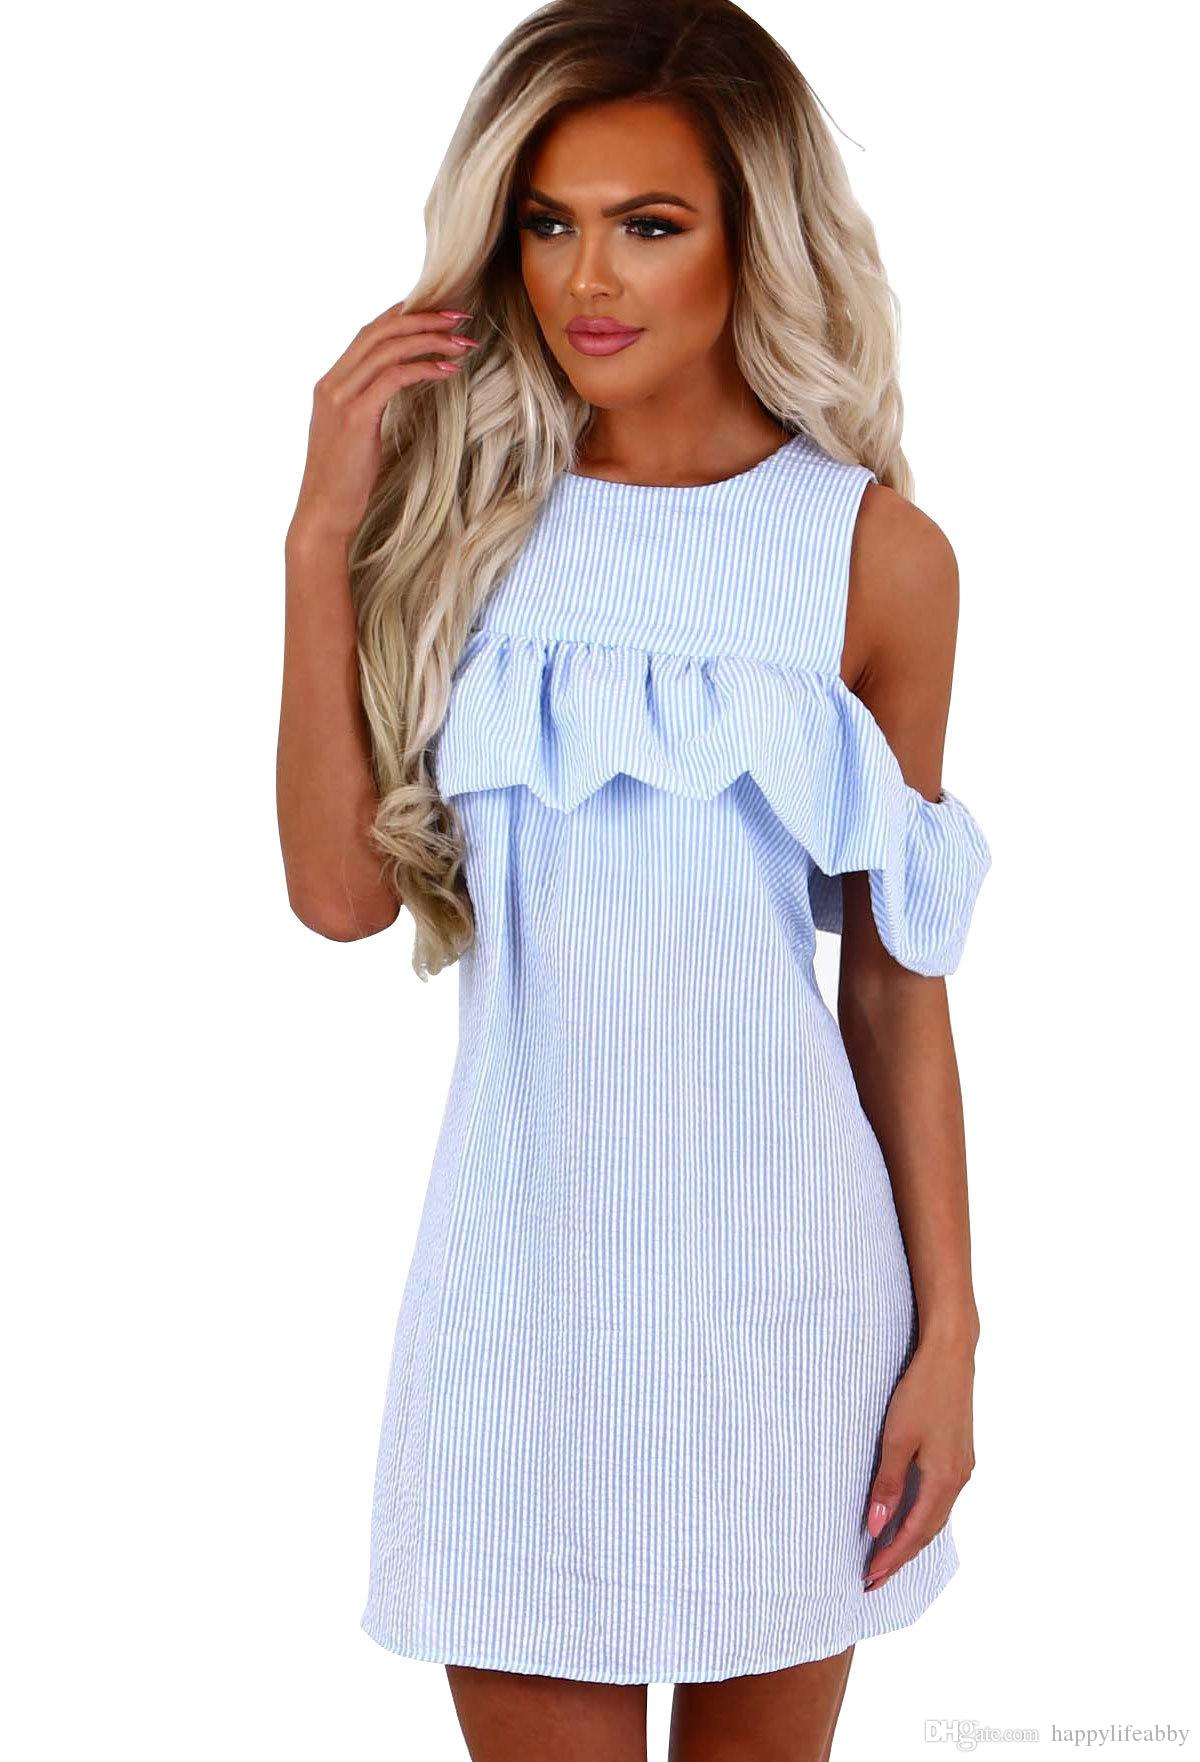 Seersucker Dress Women Ruffle Sleeve Shirts Stripe Shoulder Off